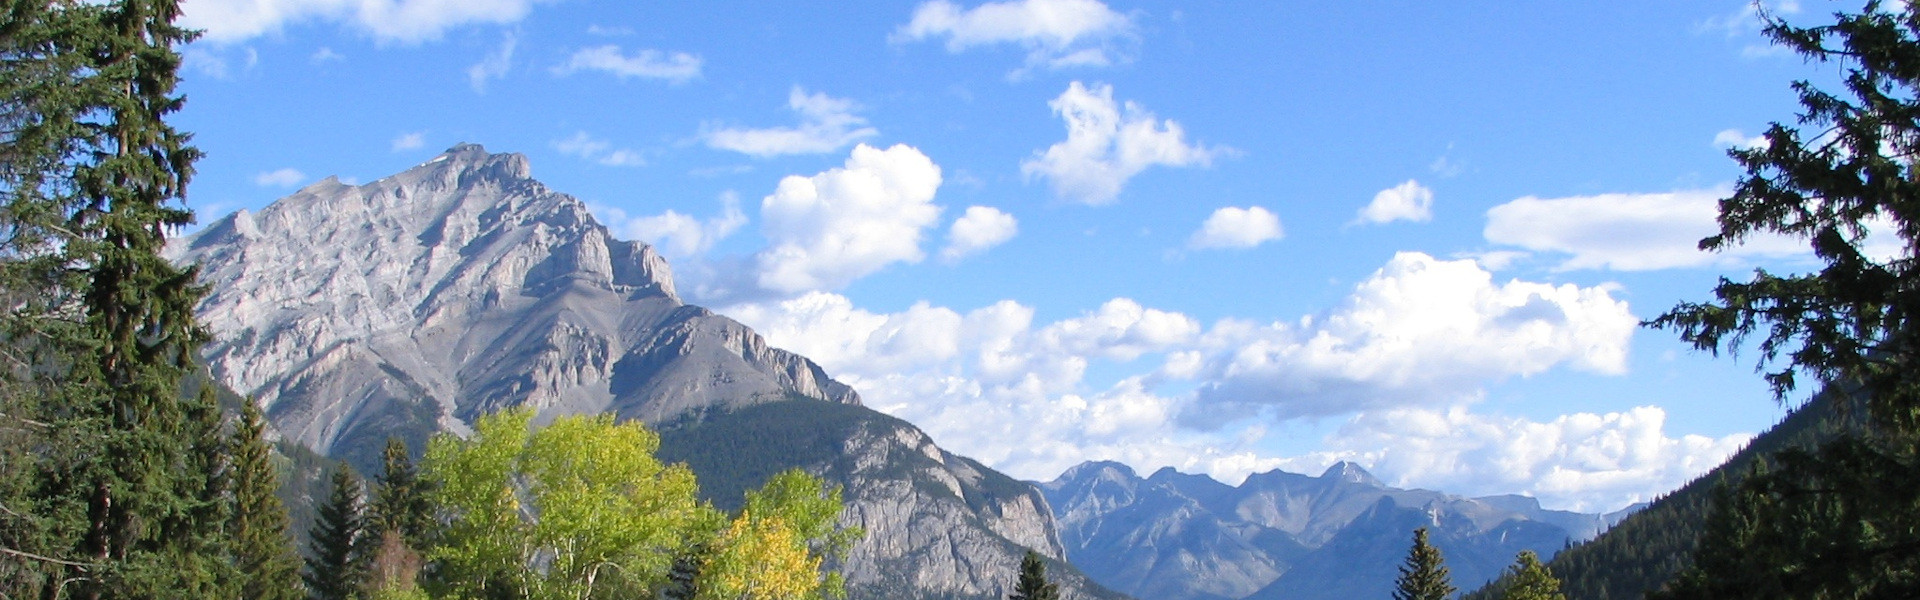 Medicine-Hat-School-District-Mountain-Scenic